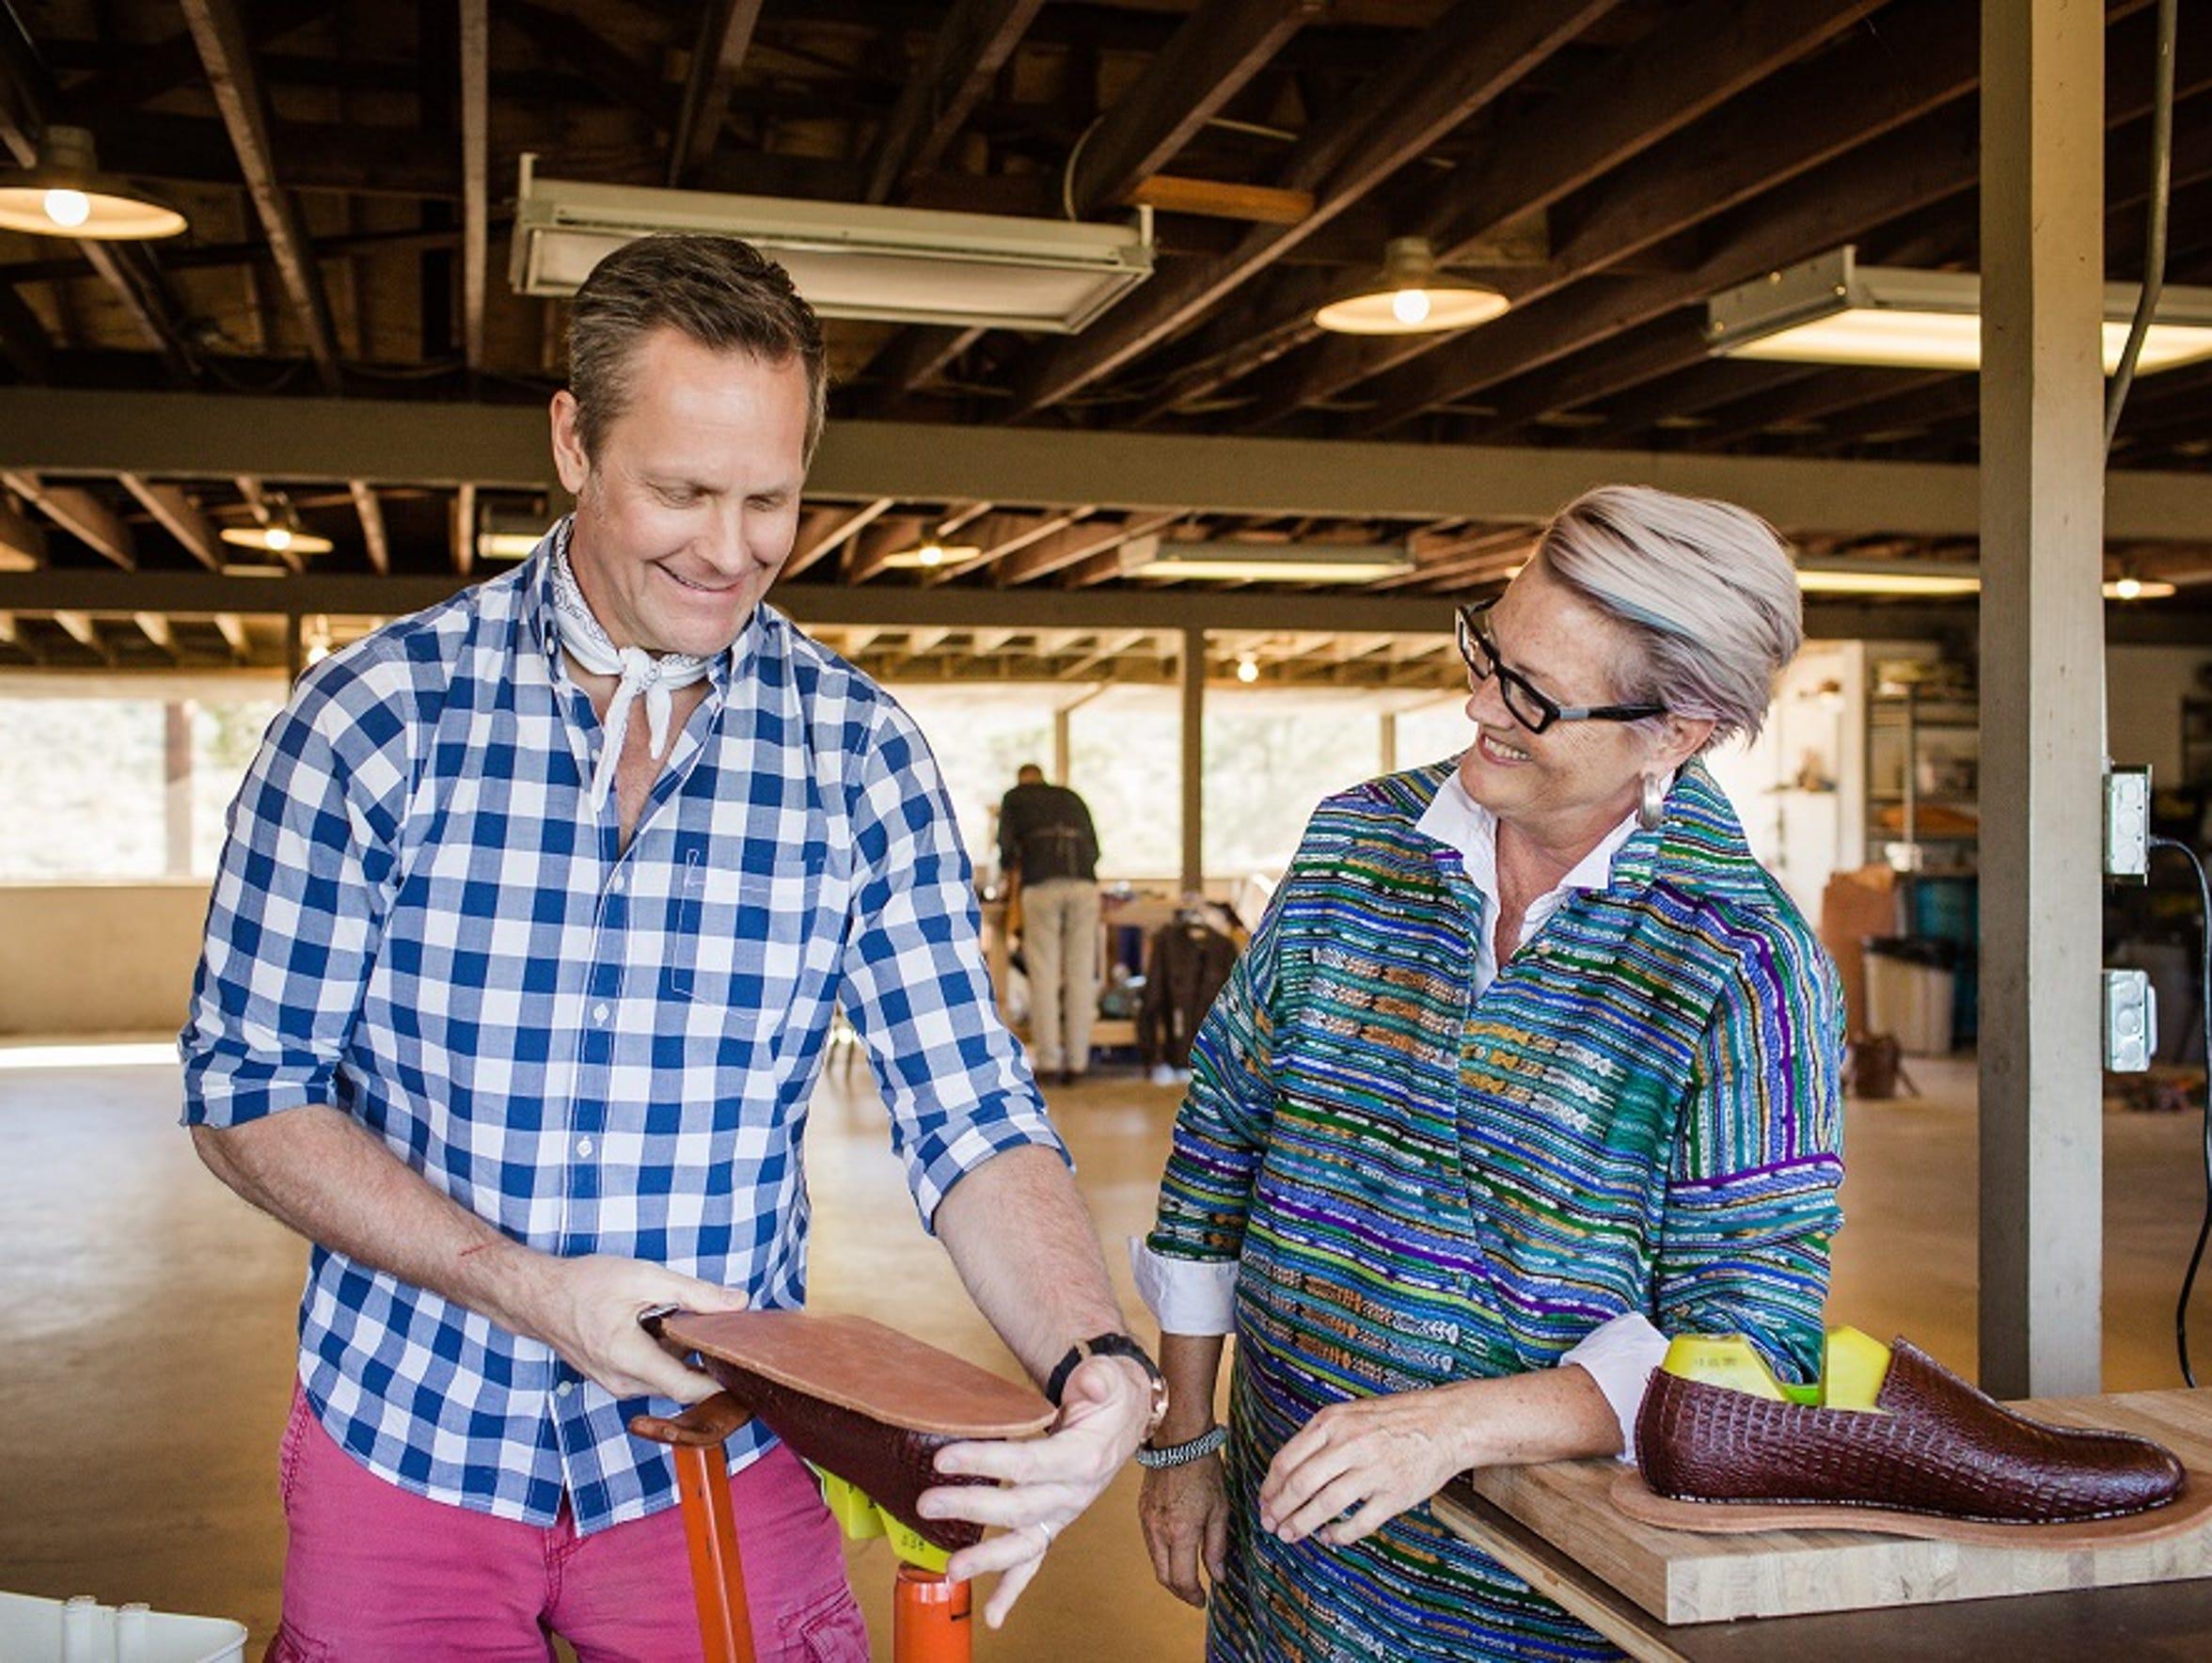 Debra Hovel shows Kurt Cyr the steps in shoemaking.